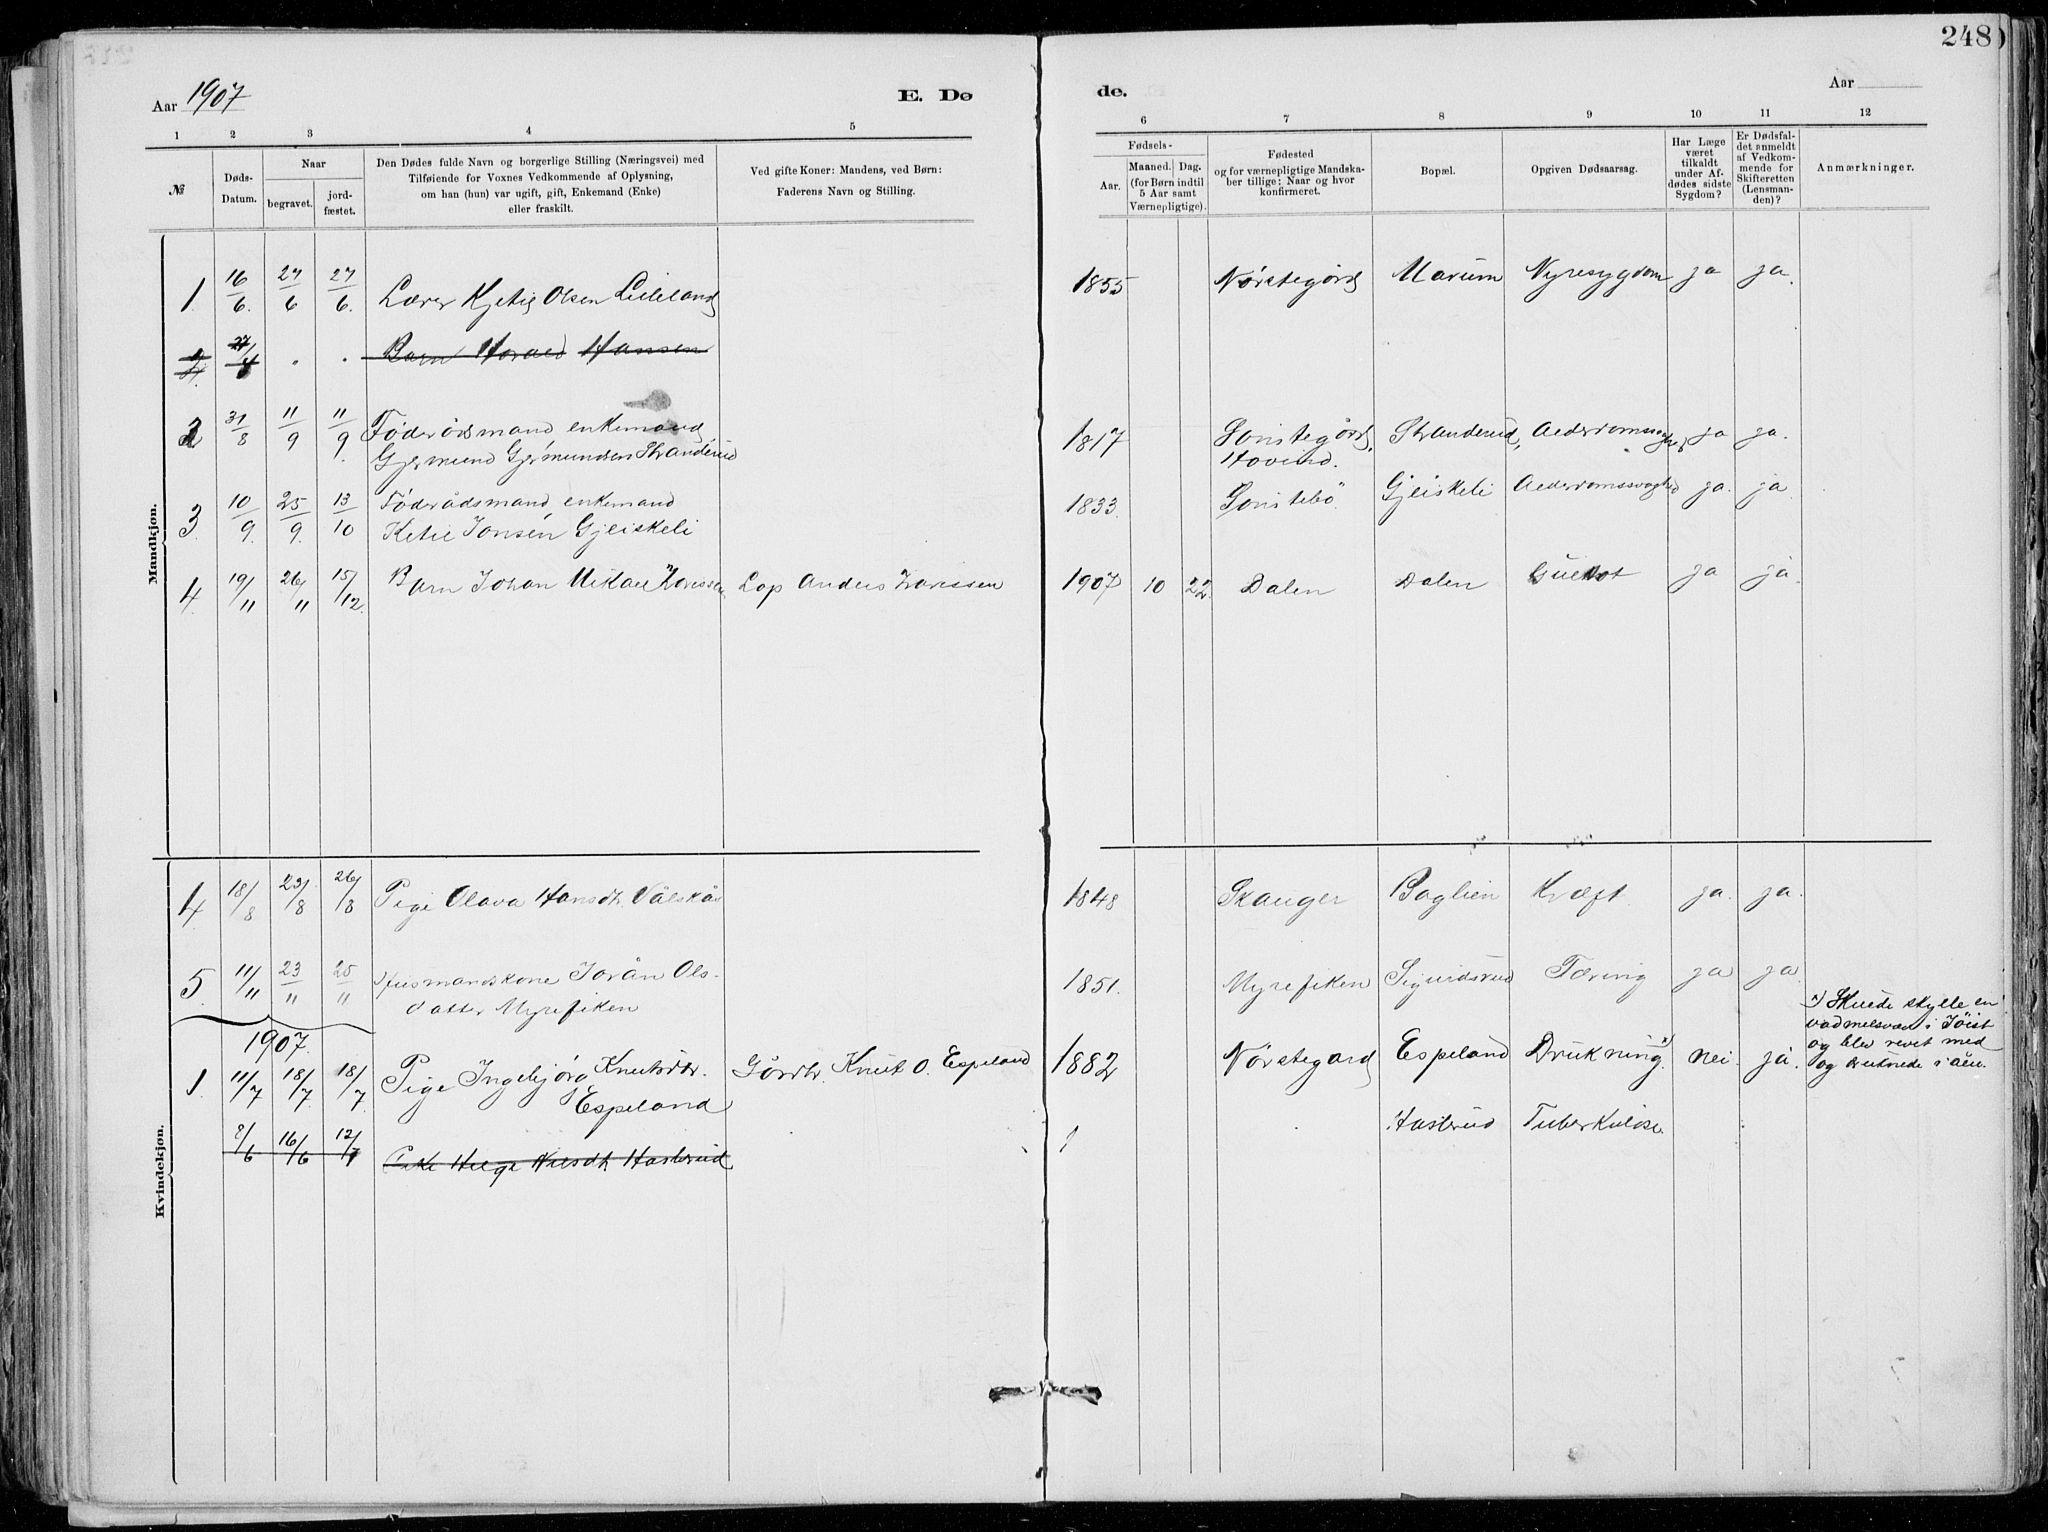 SAKO, Tinn kirkebøker, F/Fa/L0007: Ministerialbok nr. I 7, 1878-1922, s. 248